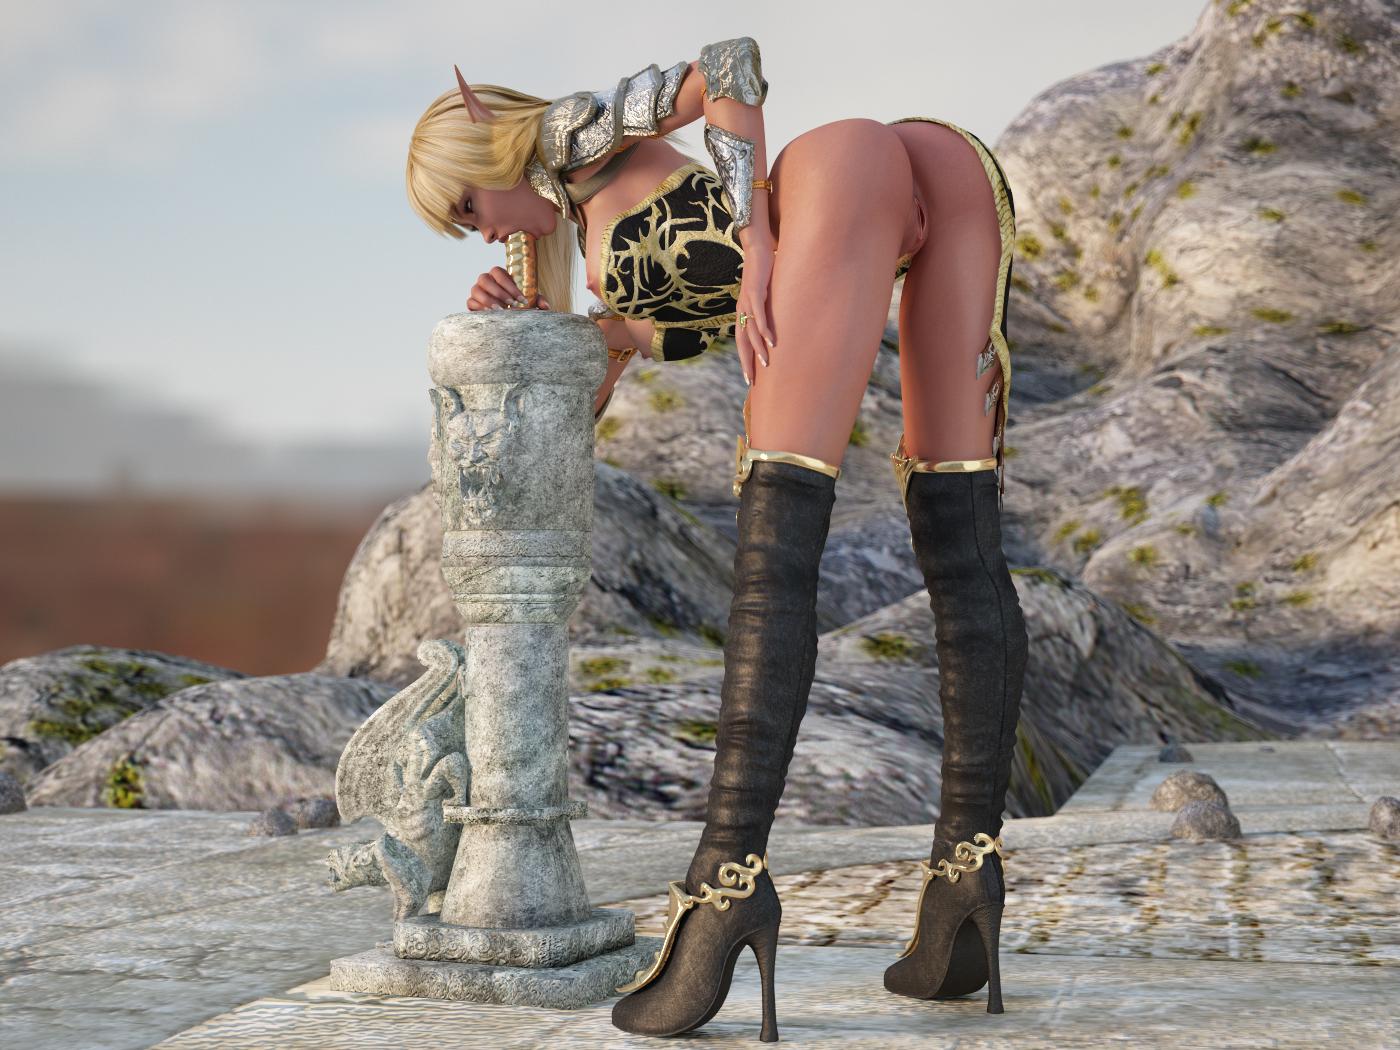 World of porncraft blonde elf adult picture